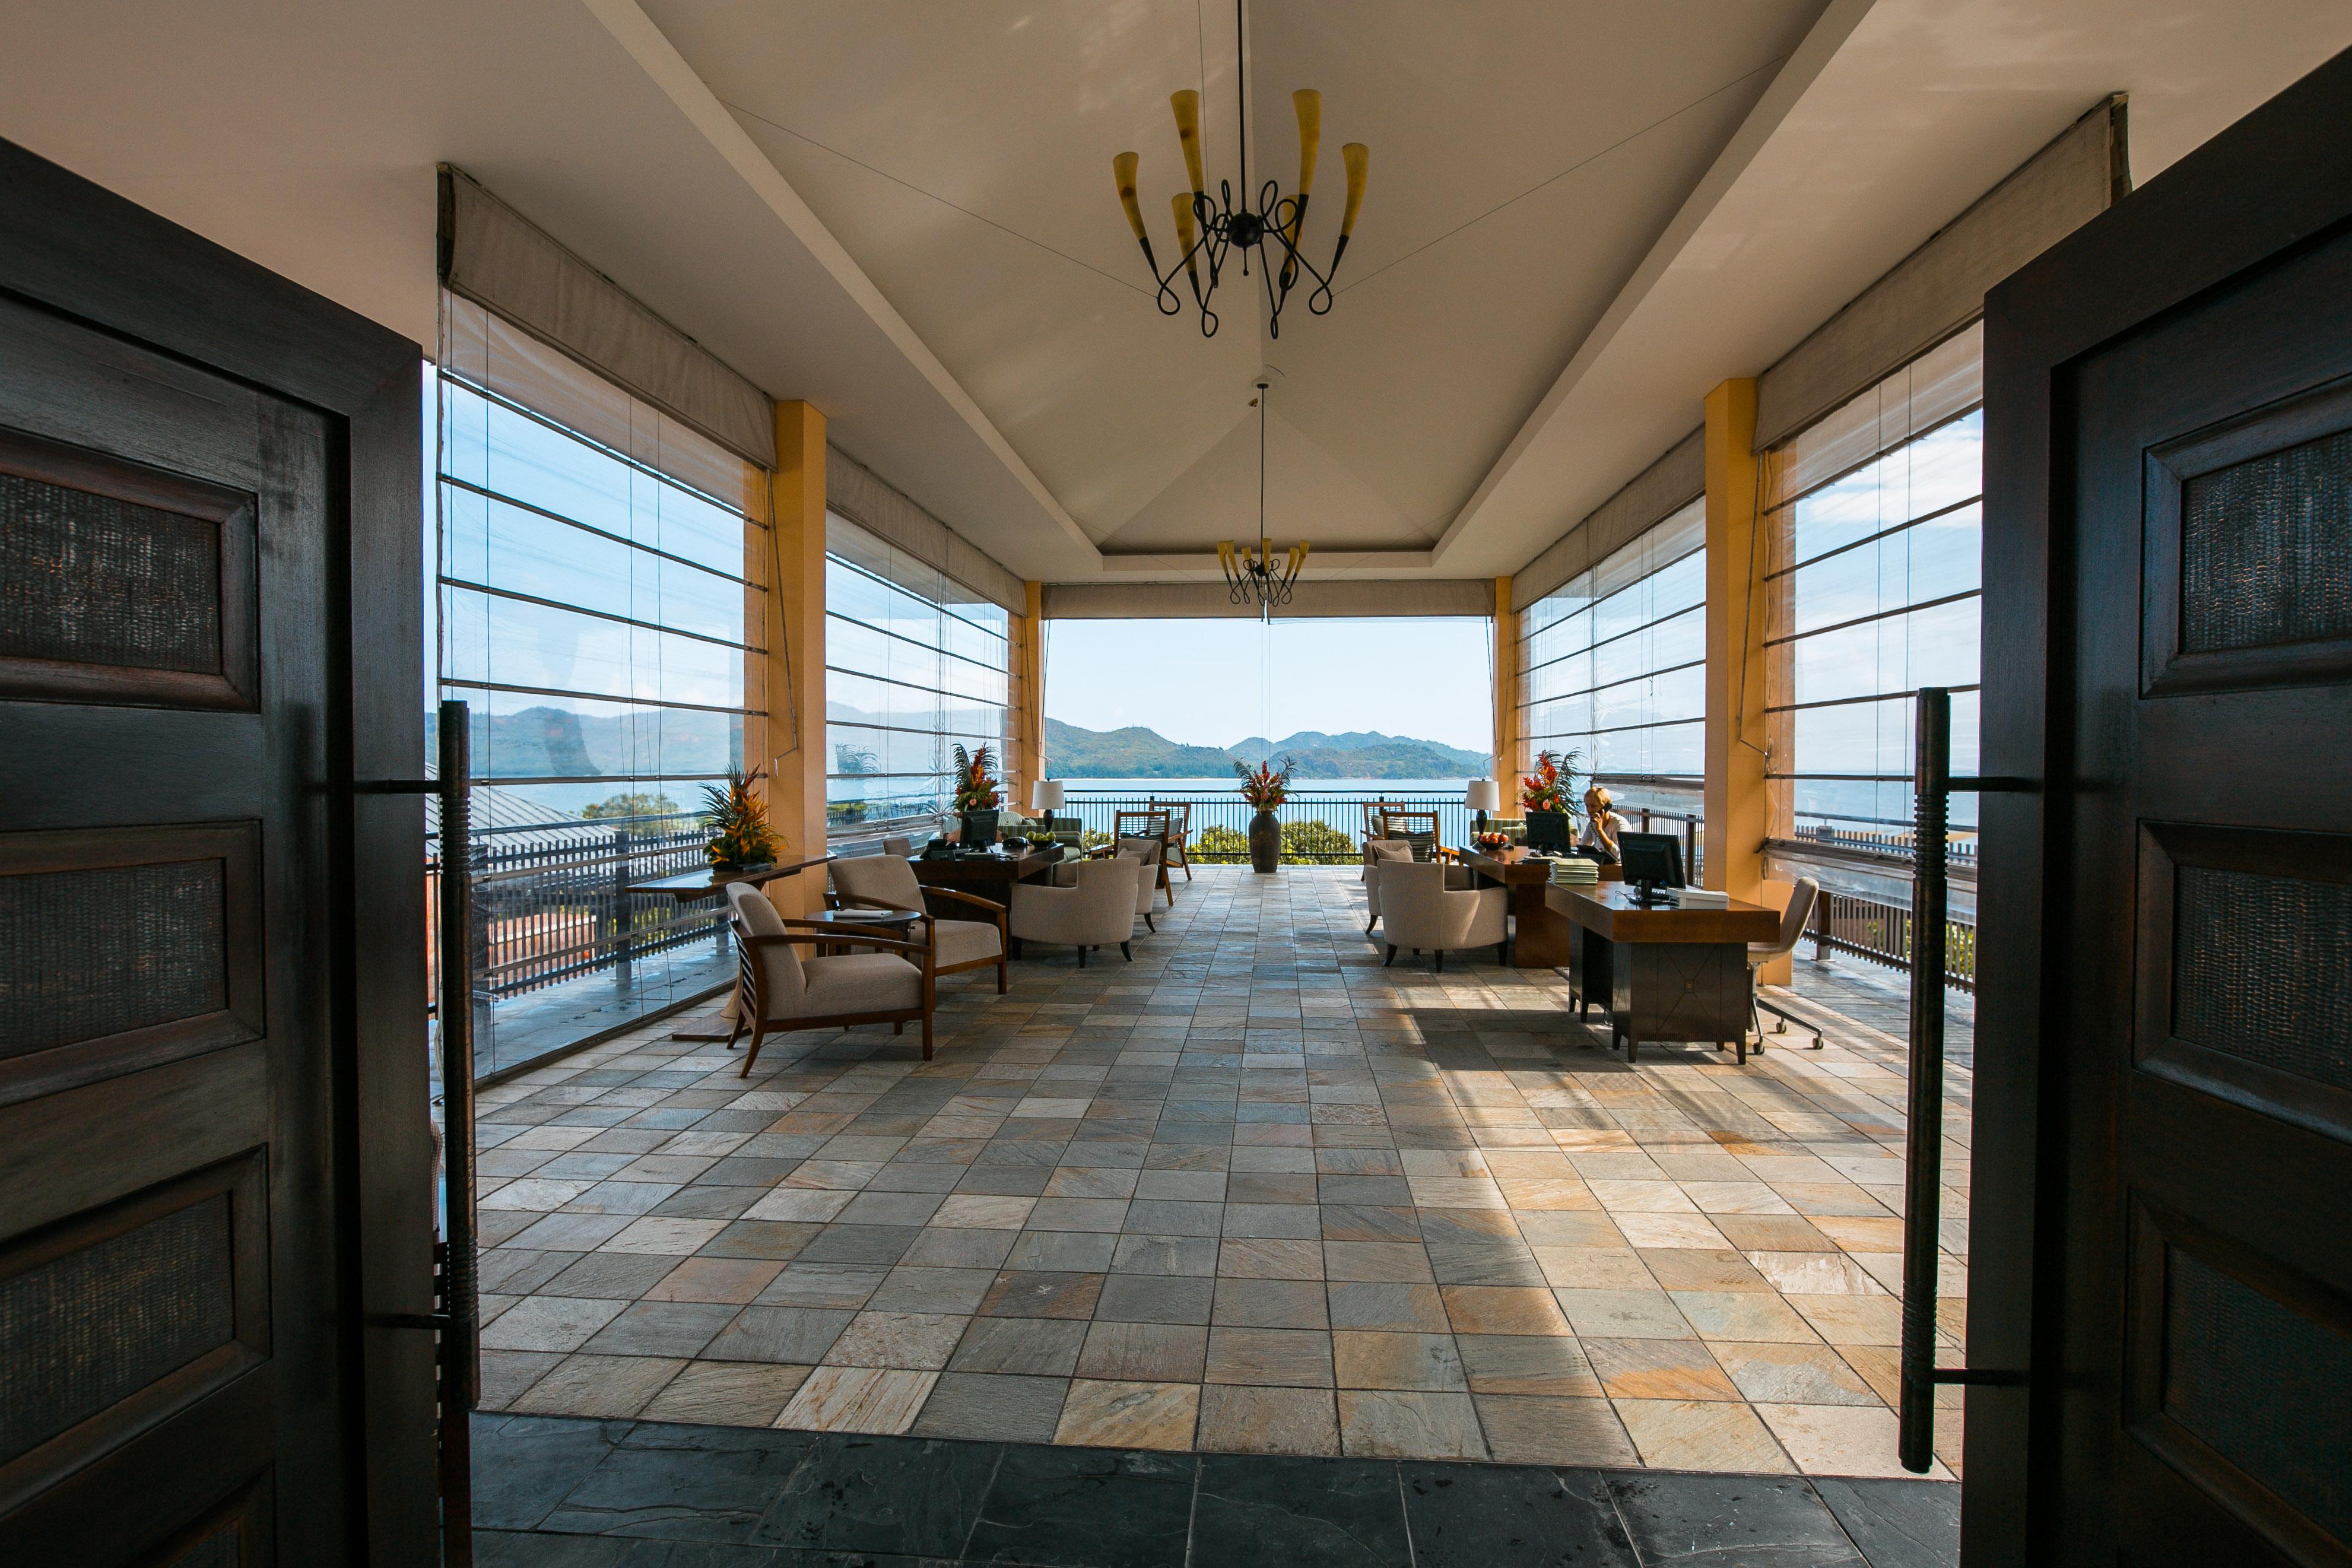 Raffles Praslin Seychellen, Hotels Seychellen, Hotels Praslin, Unterkünfte Tipps